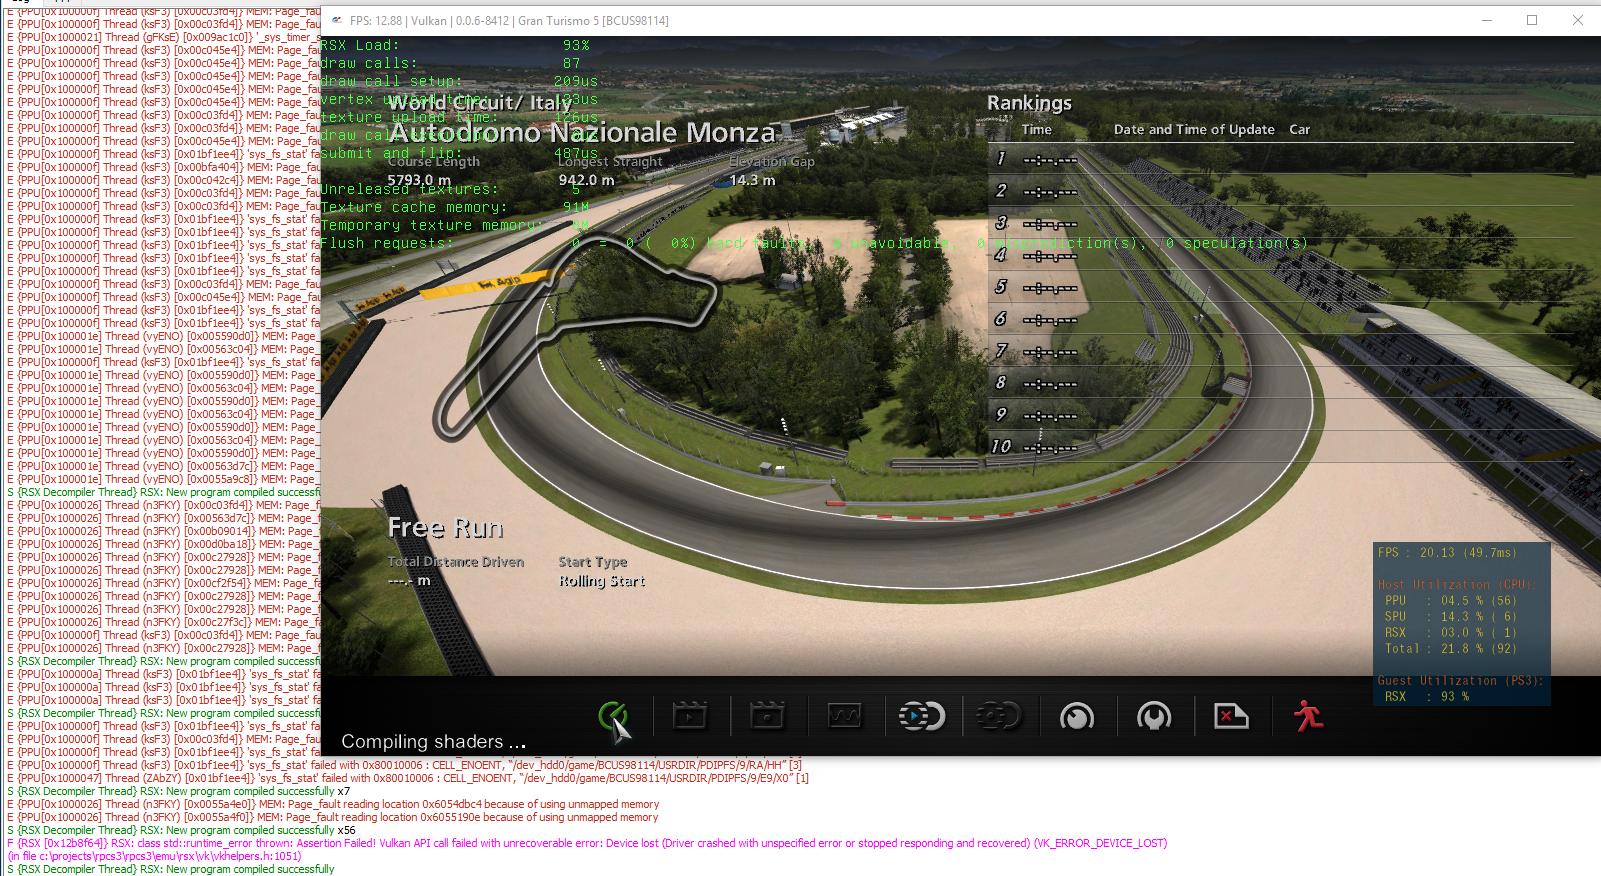 Gran Turismo 5 [BCUS98114] crash on loading circuit after